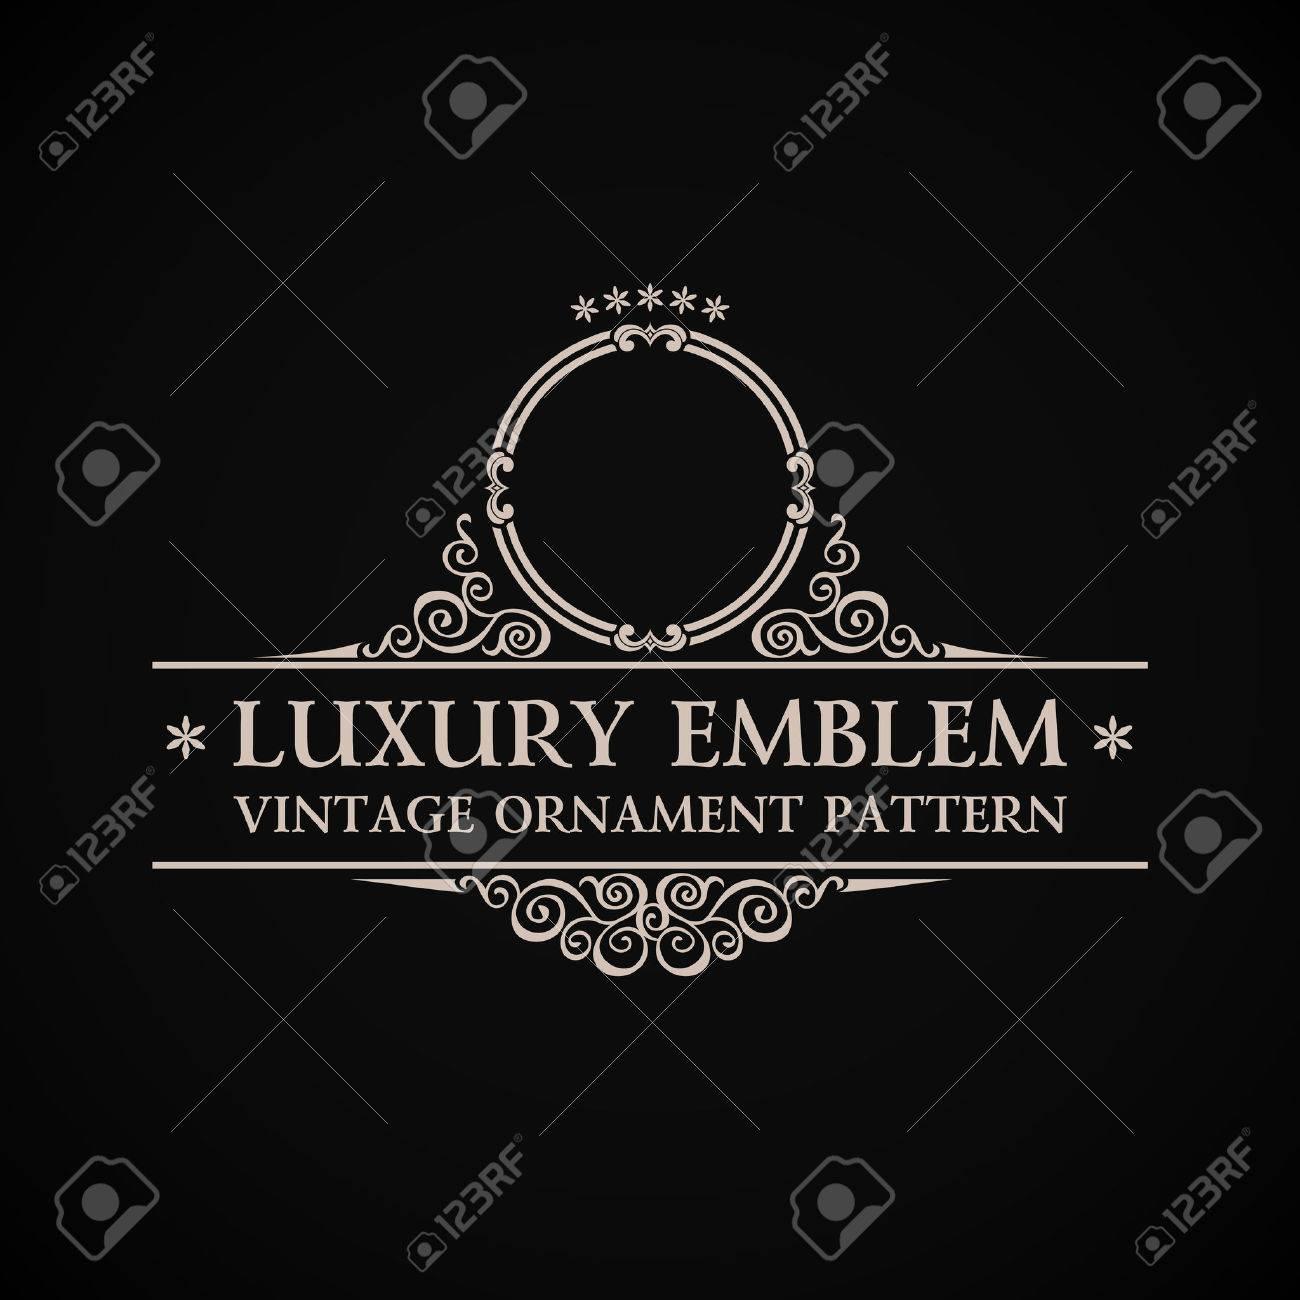 Vintage vector logo. Calligraphic elegant decor element ornament - 40911787